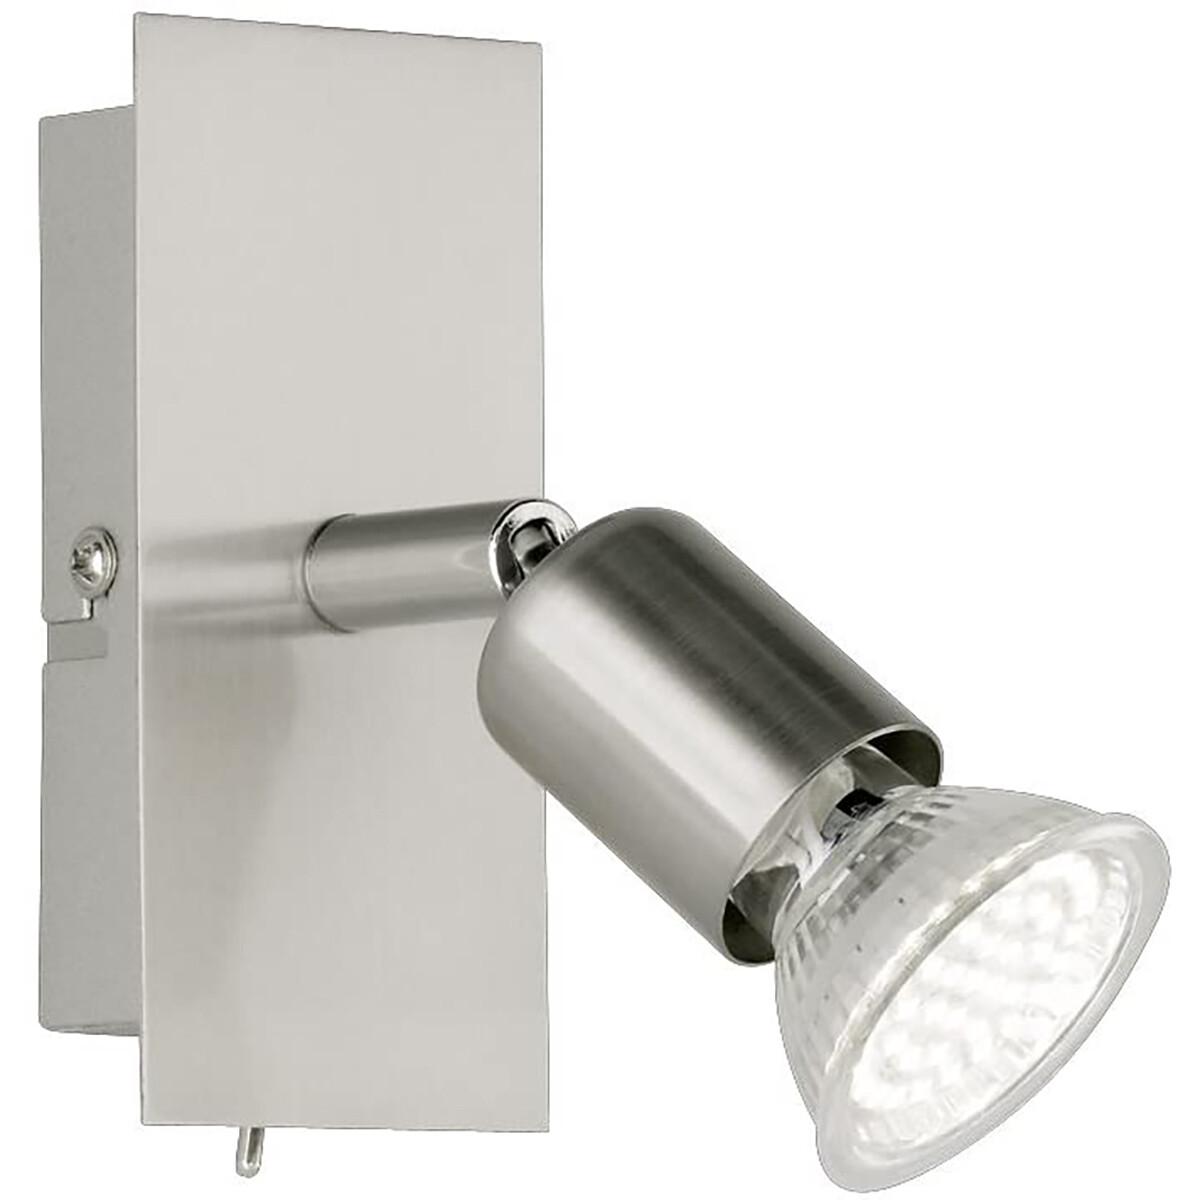 LED Wandspot - Trion Nimo - GU10 Fitting - 3W - Warm Wit 3000K - 1-lichts - Rechthoek - Mat Nikkel -